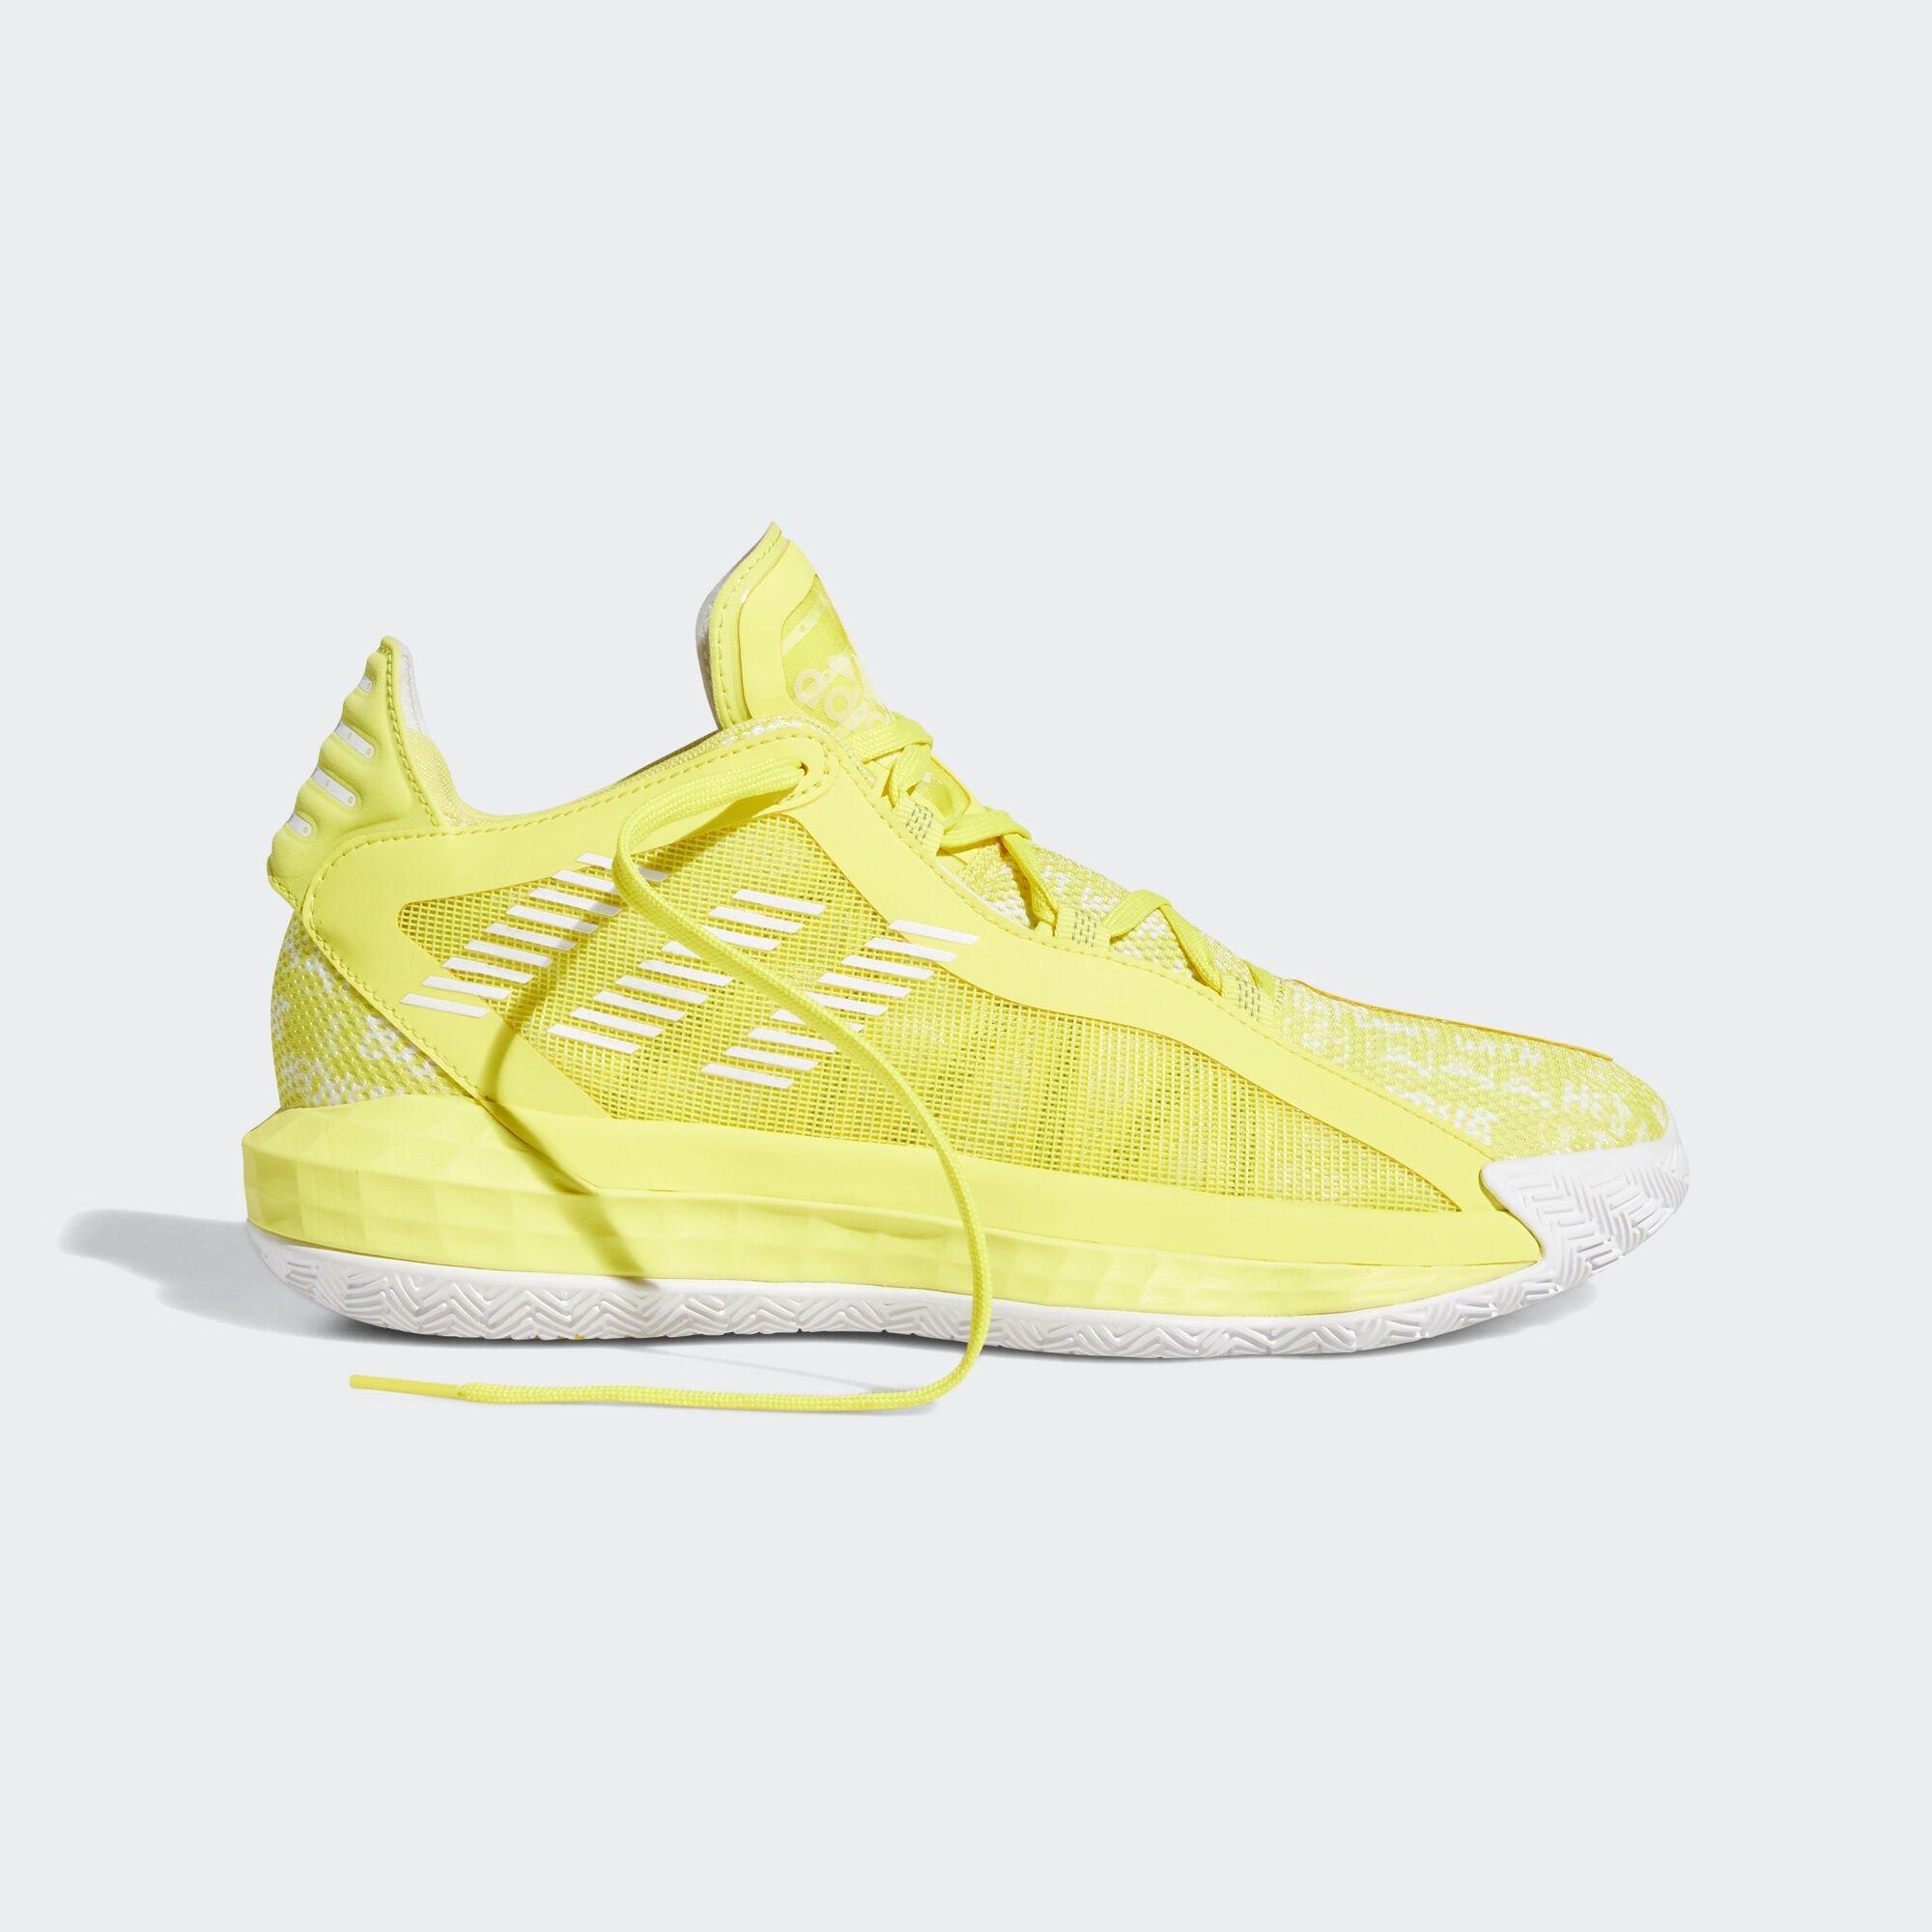 adidas Dame 6 Shock Yellow White (FU6810)